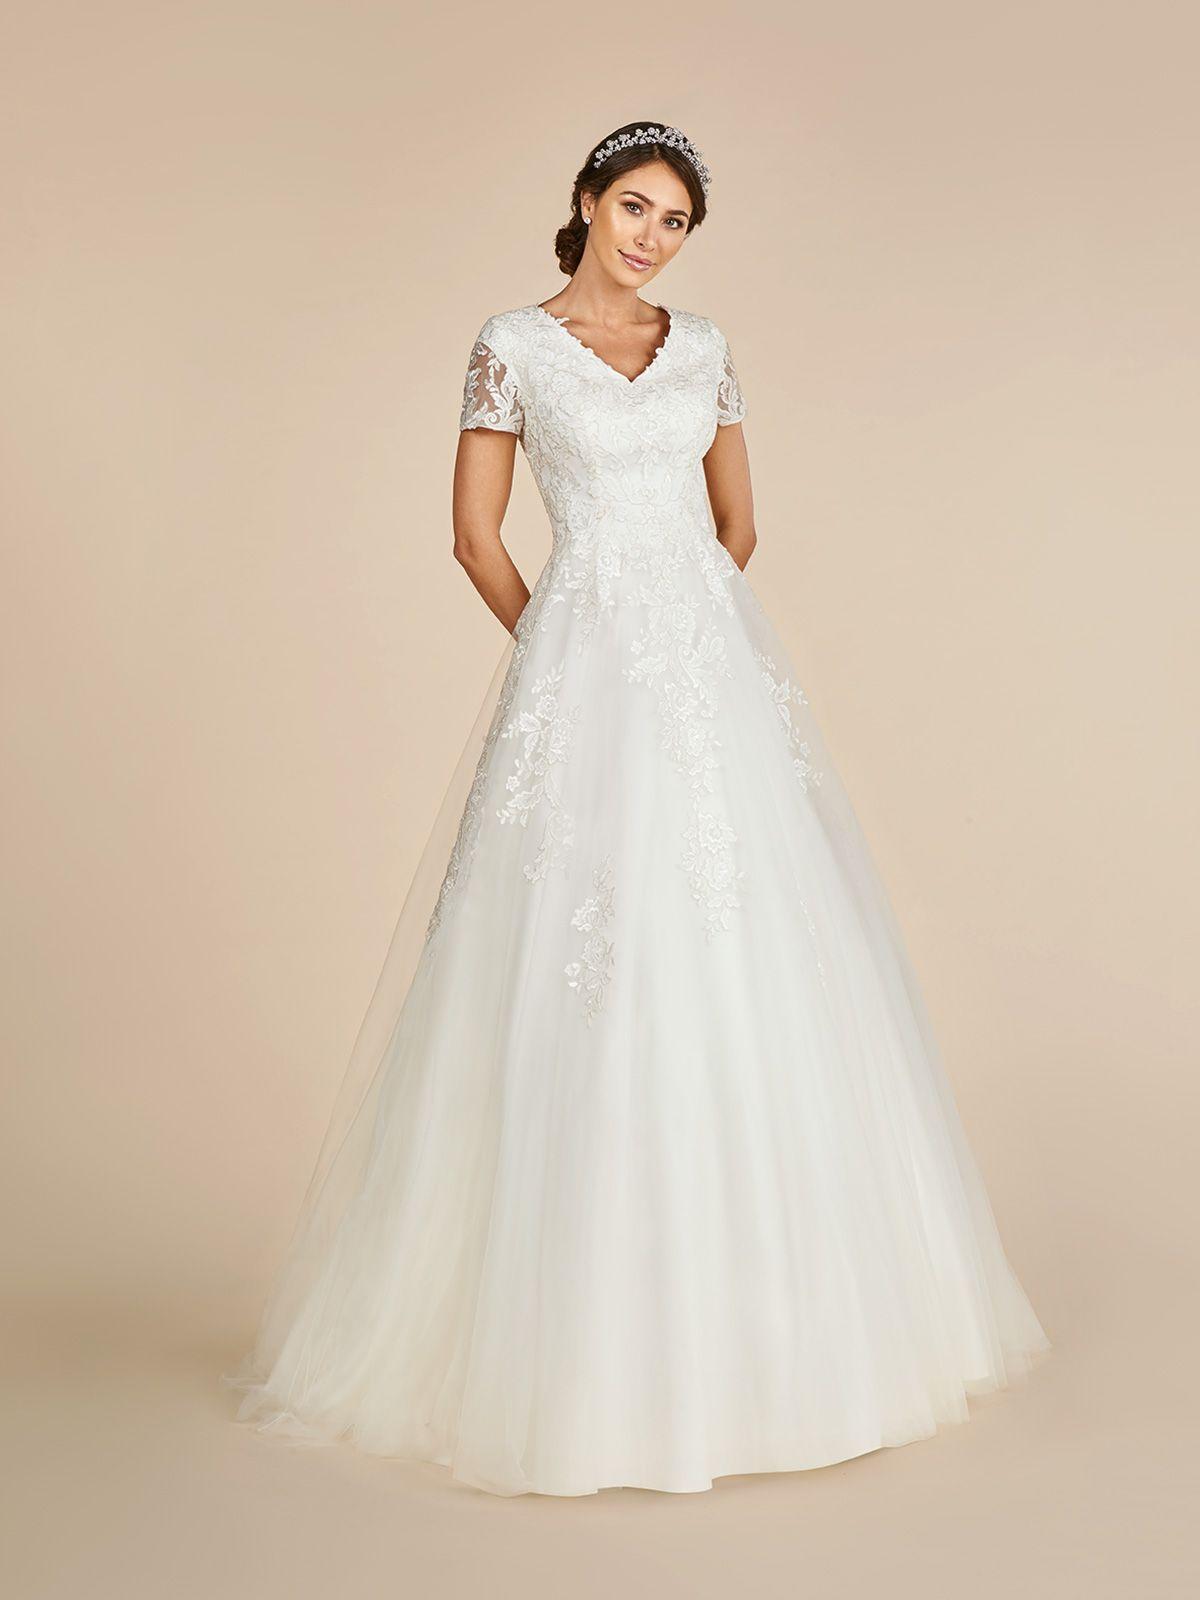 Moonlight Modest Short Sleeved Tulle Wedding Dress Style M5016 Wedding Dress Styles Wedding Dresses Short Wedding Dress [ 1600 x 1200 Pixel ]